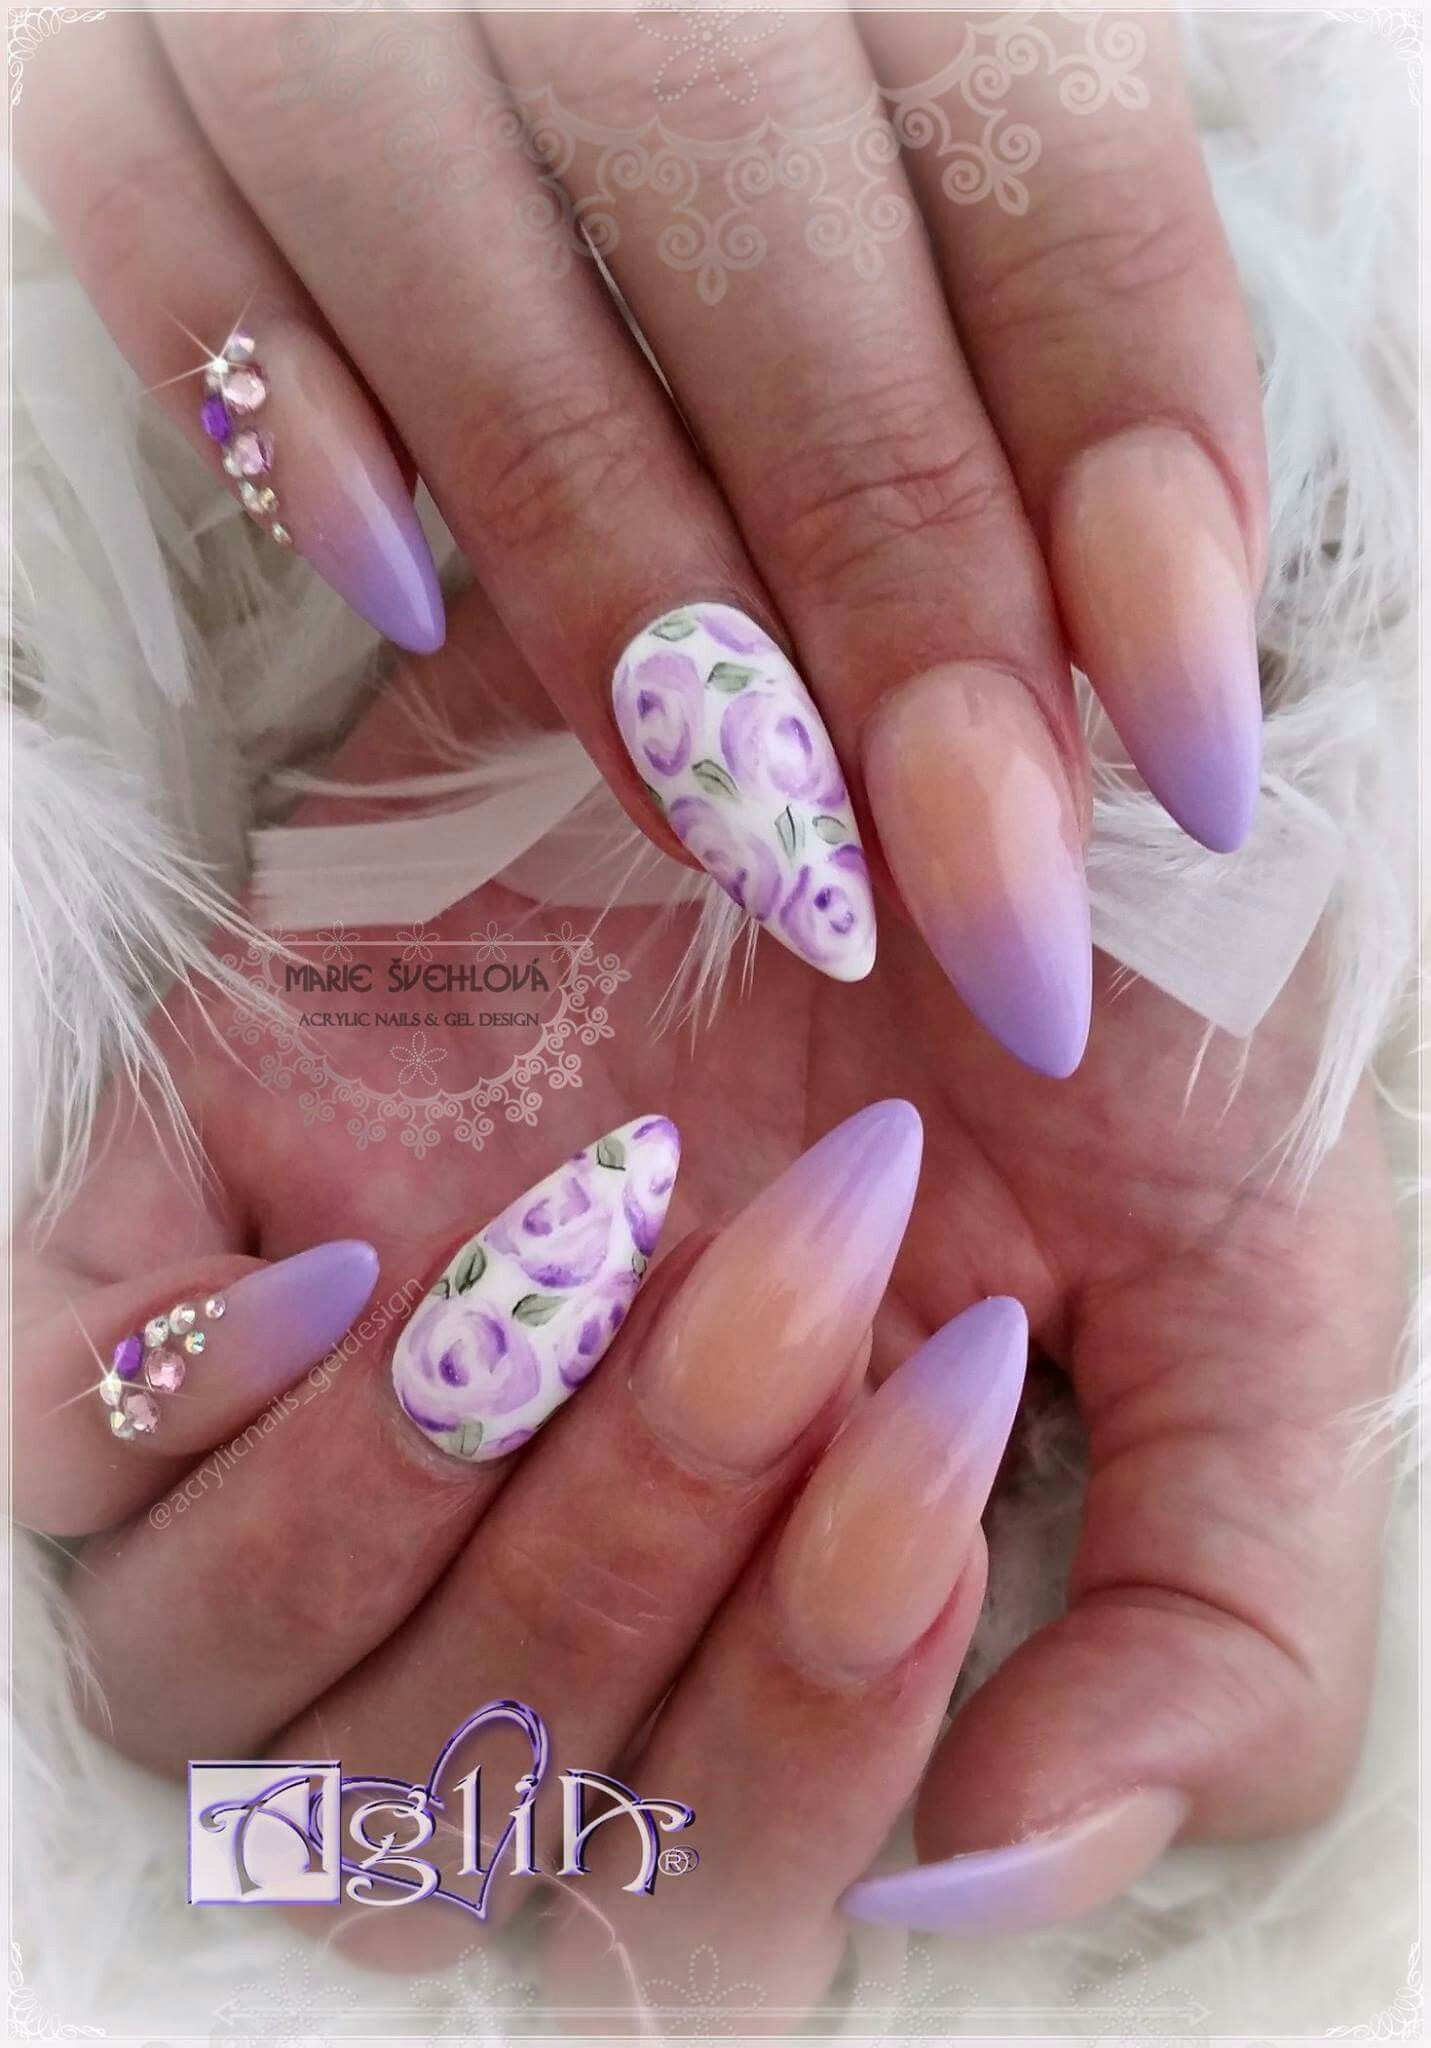 Acrylic Nails Gel Design Work Nails Rhinestone Nails Nails